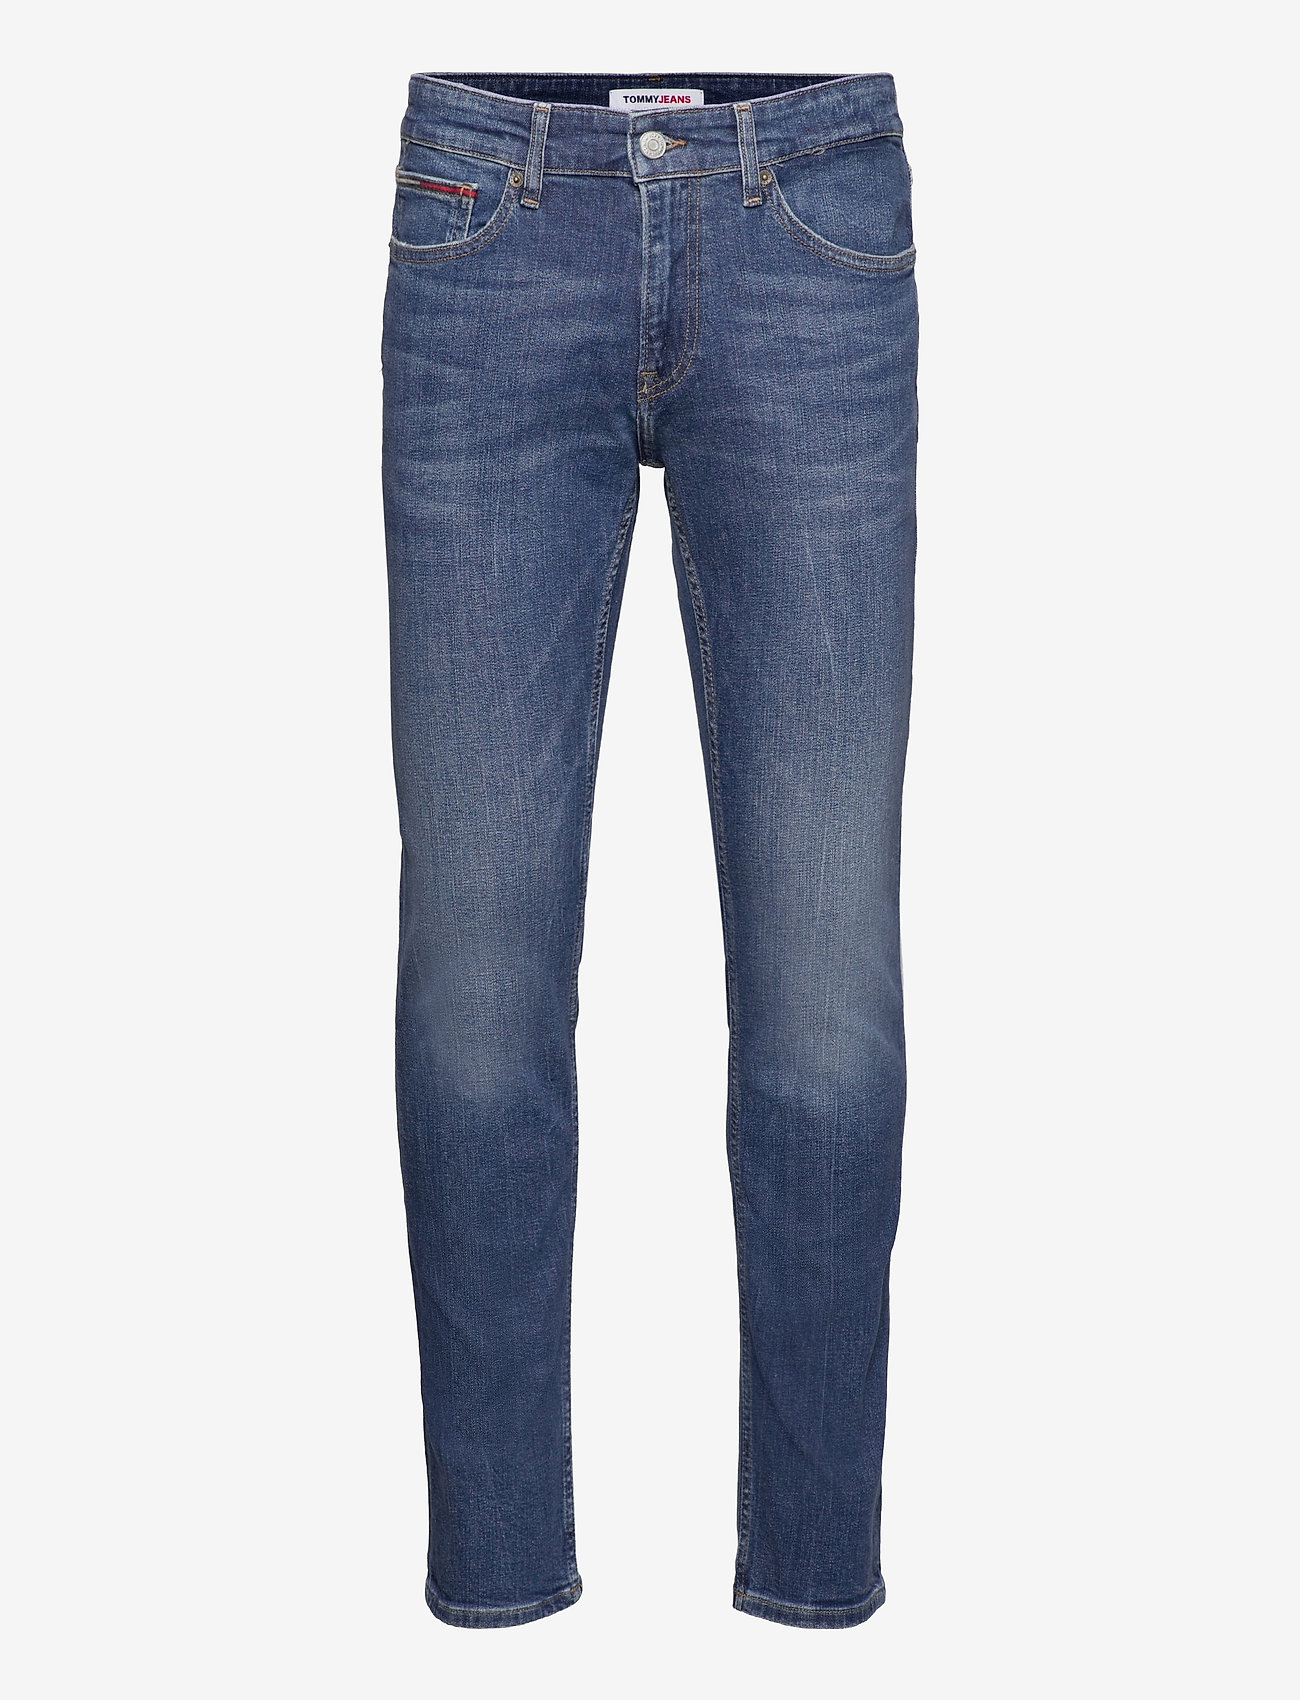 Tommy Jeans - SCANTON SLIM BE138 MBSTR - slim jeans - denim medium - 0